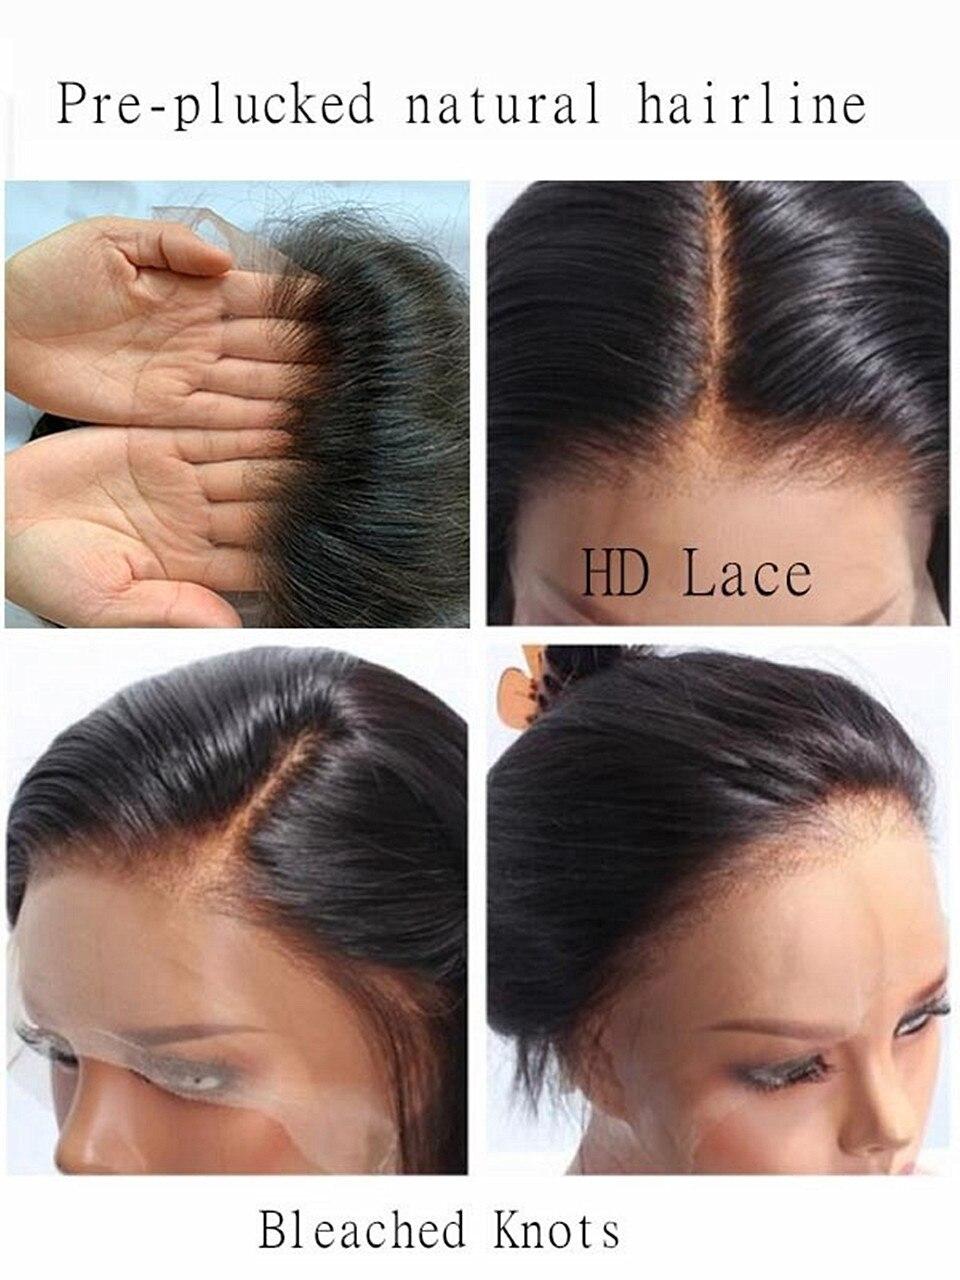 hd_lace_wigs